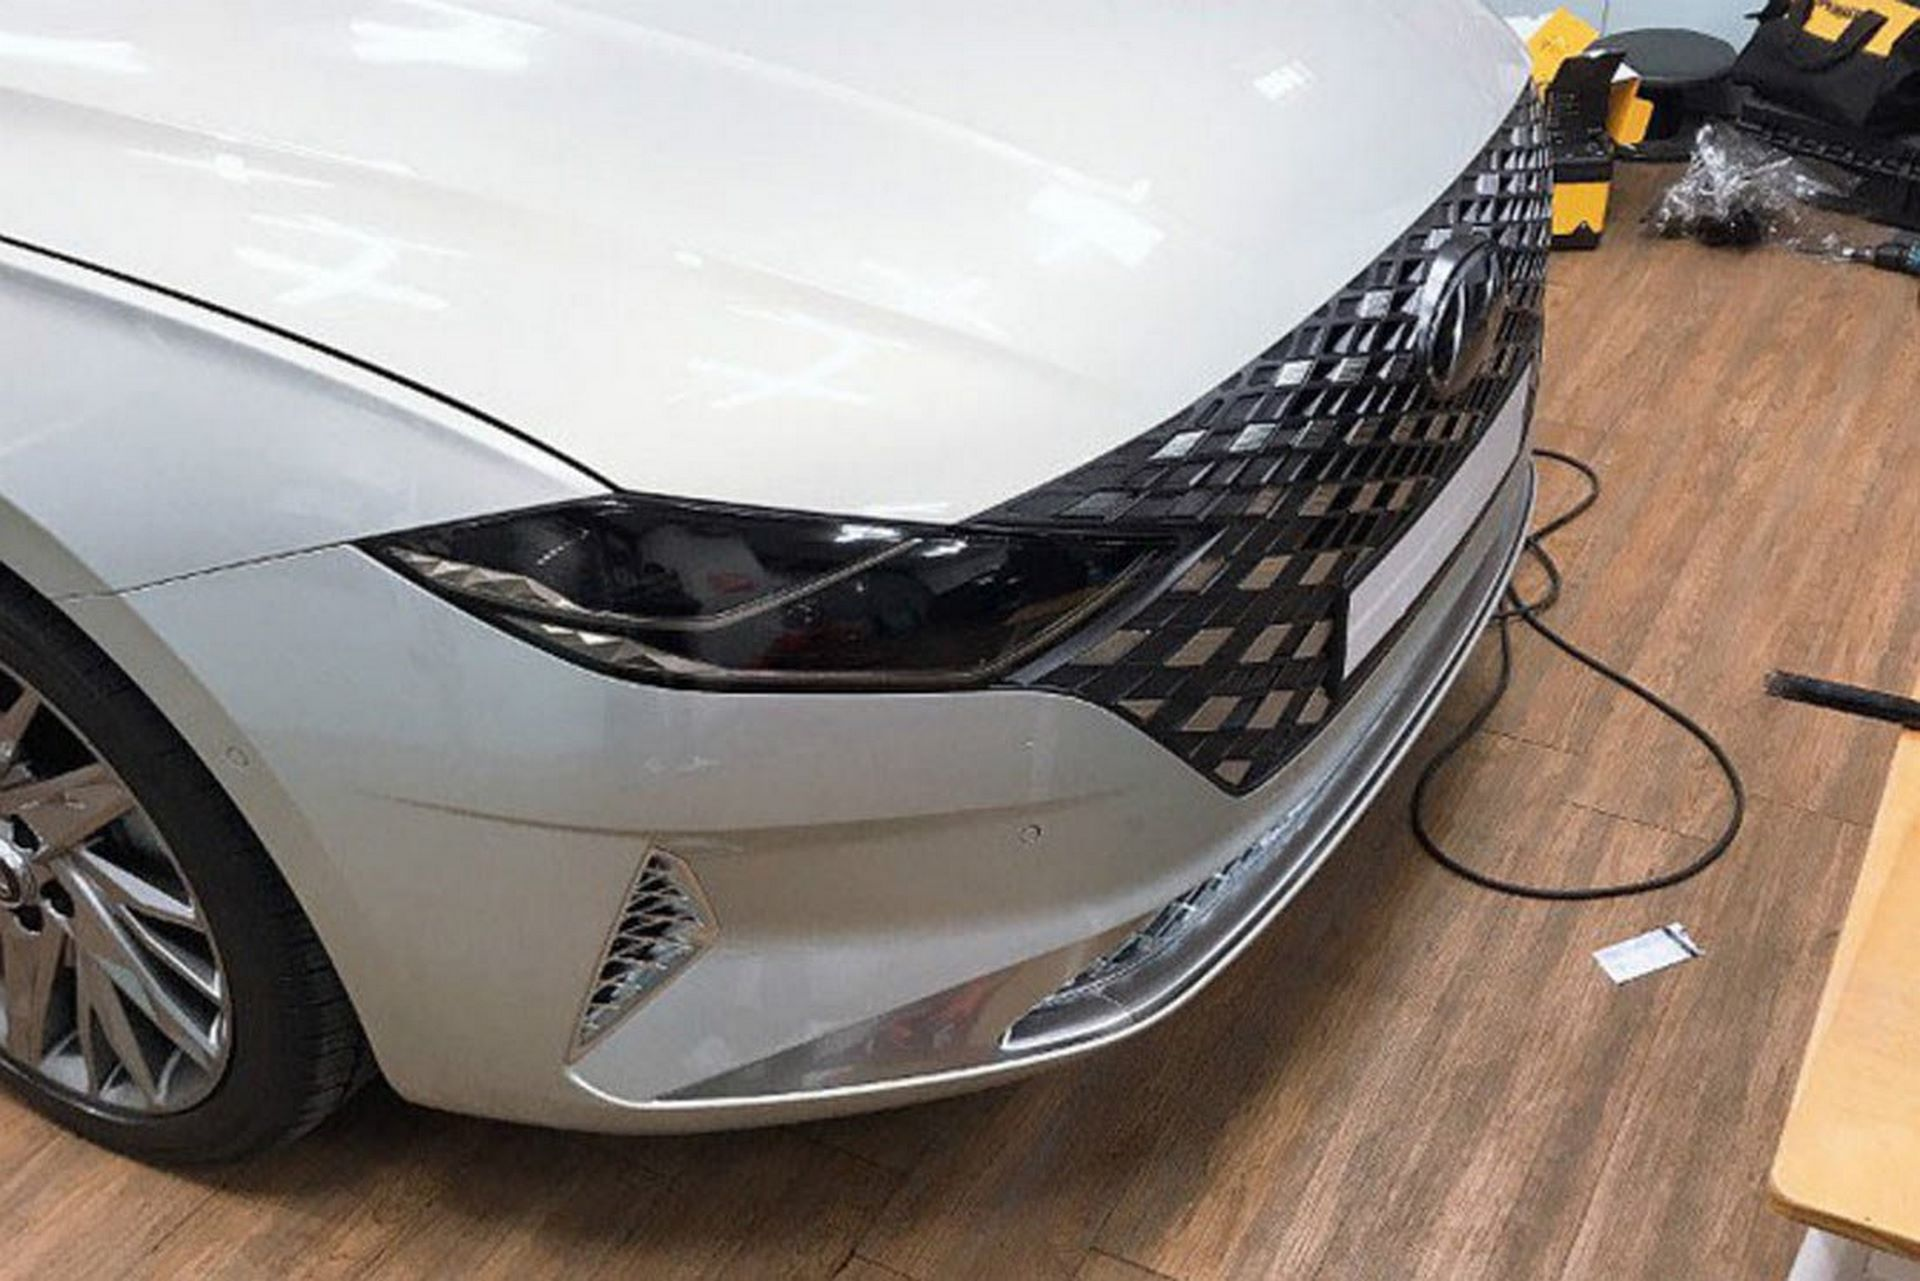 Hyundai-Grandeur-Azera-2020-leaked-photos-1